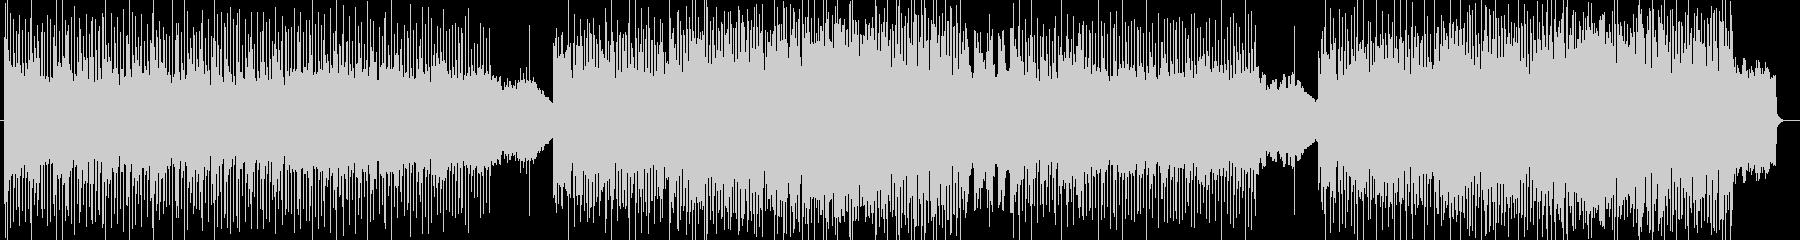 「HR/HM」「DEATH」BGM249の未再生の波形